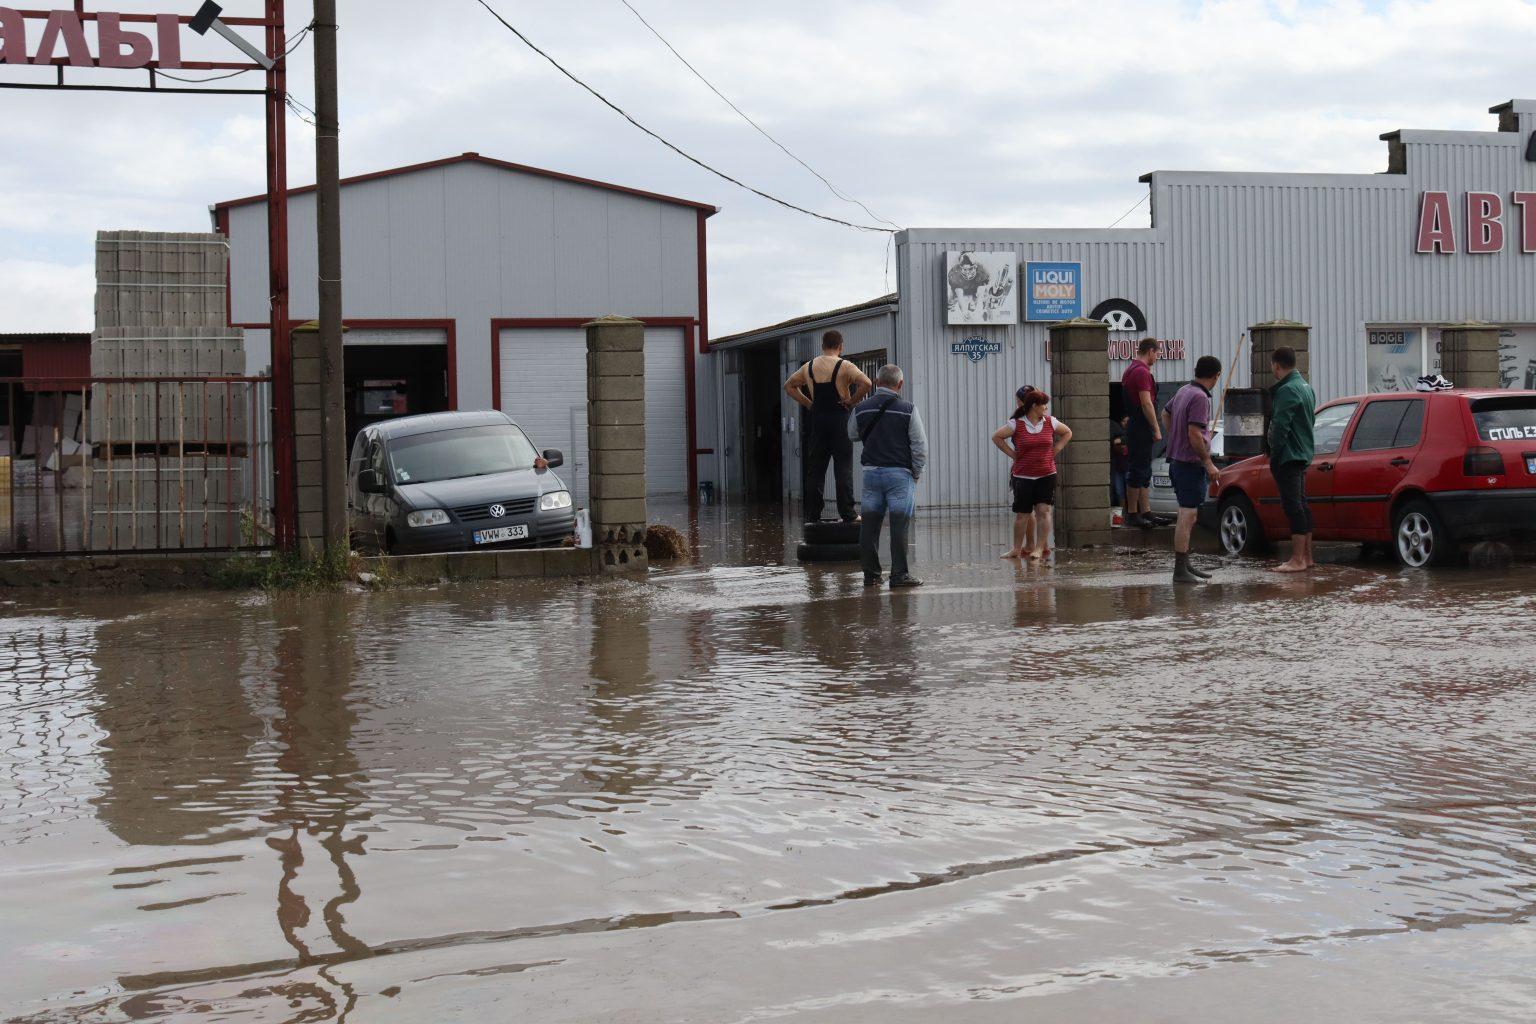 ВКомрате из-за ливня сотни домов остались без газа (ФОТО)